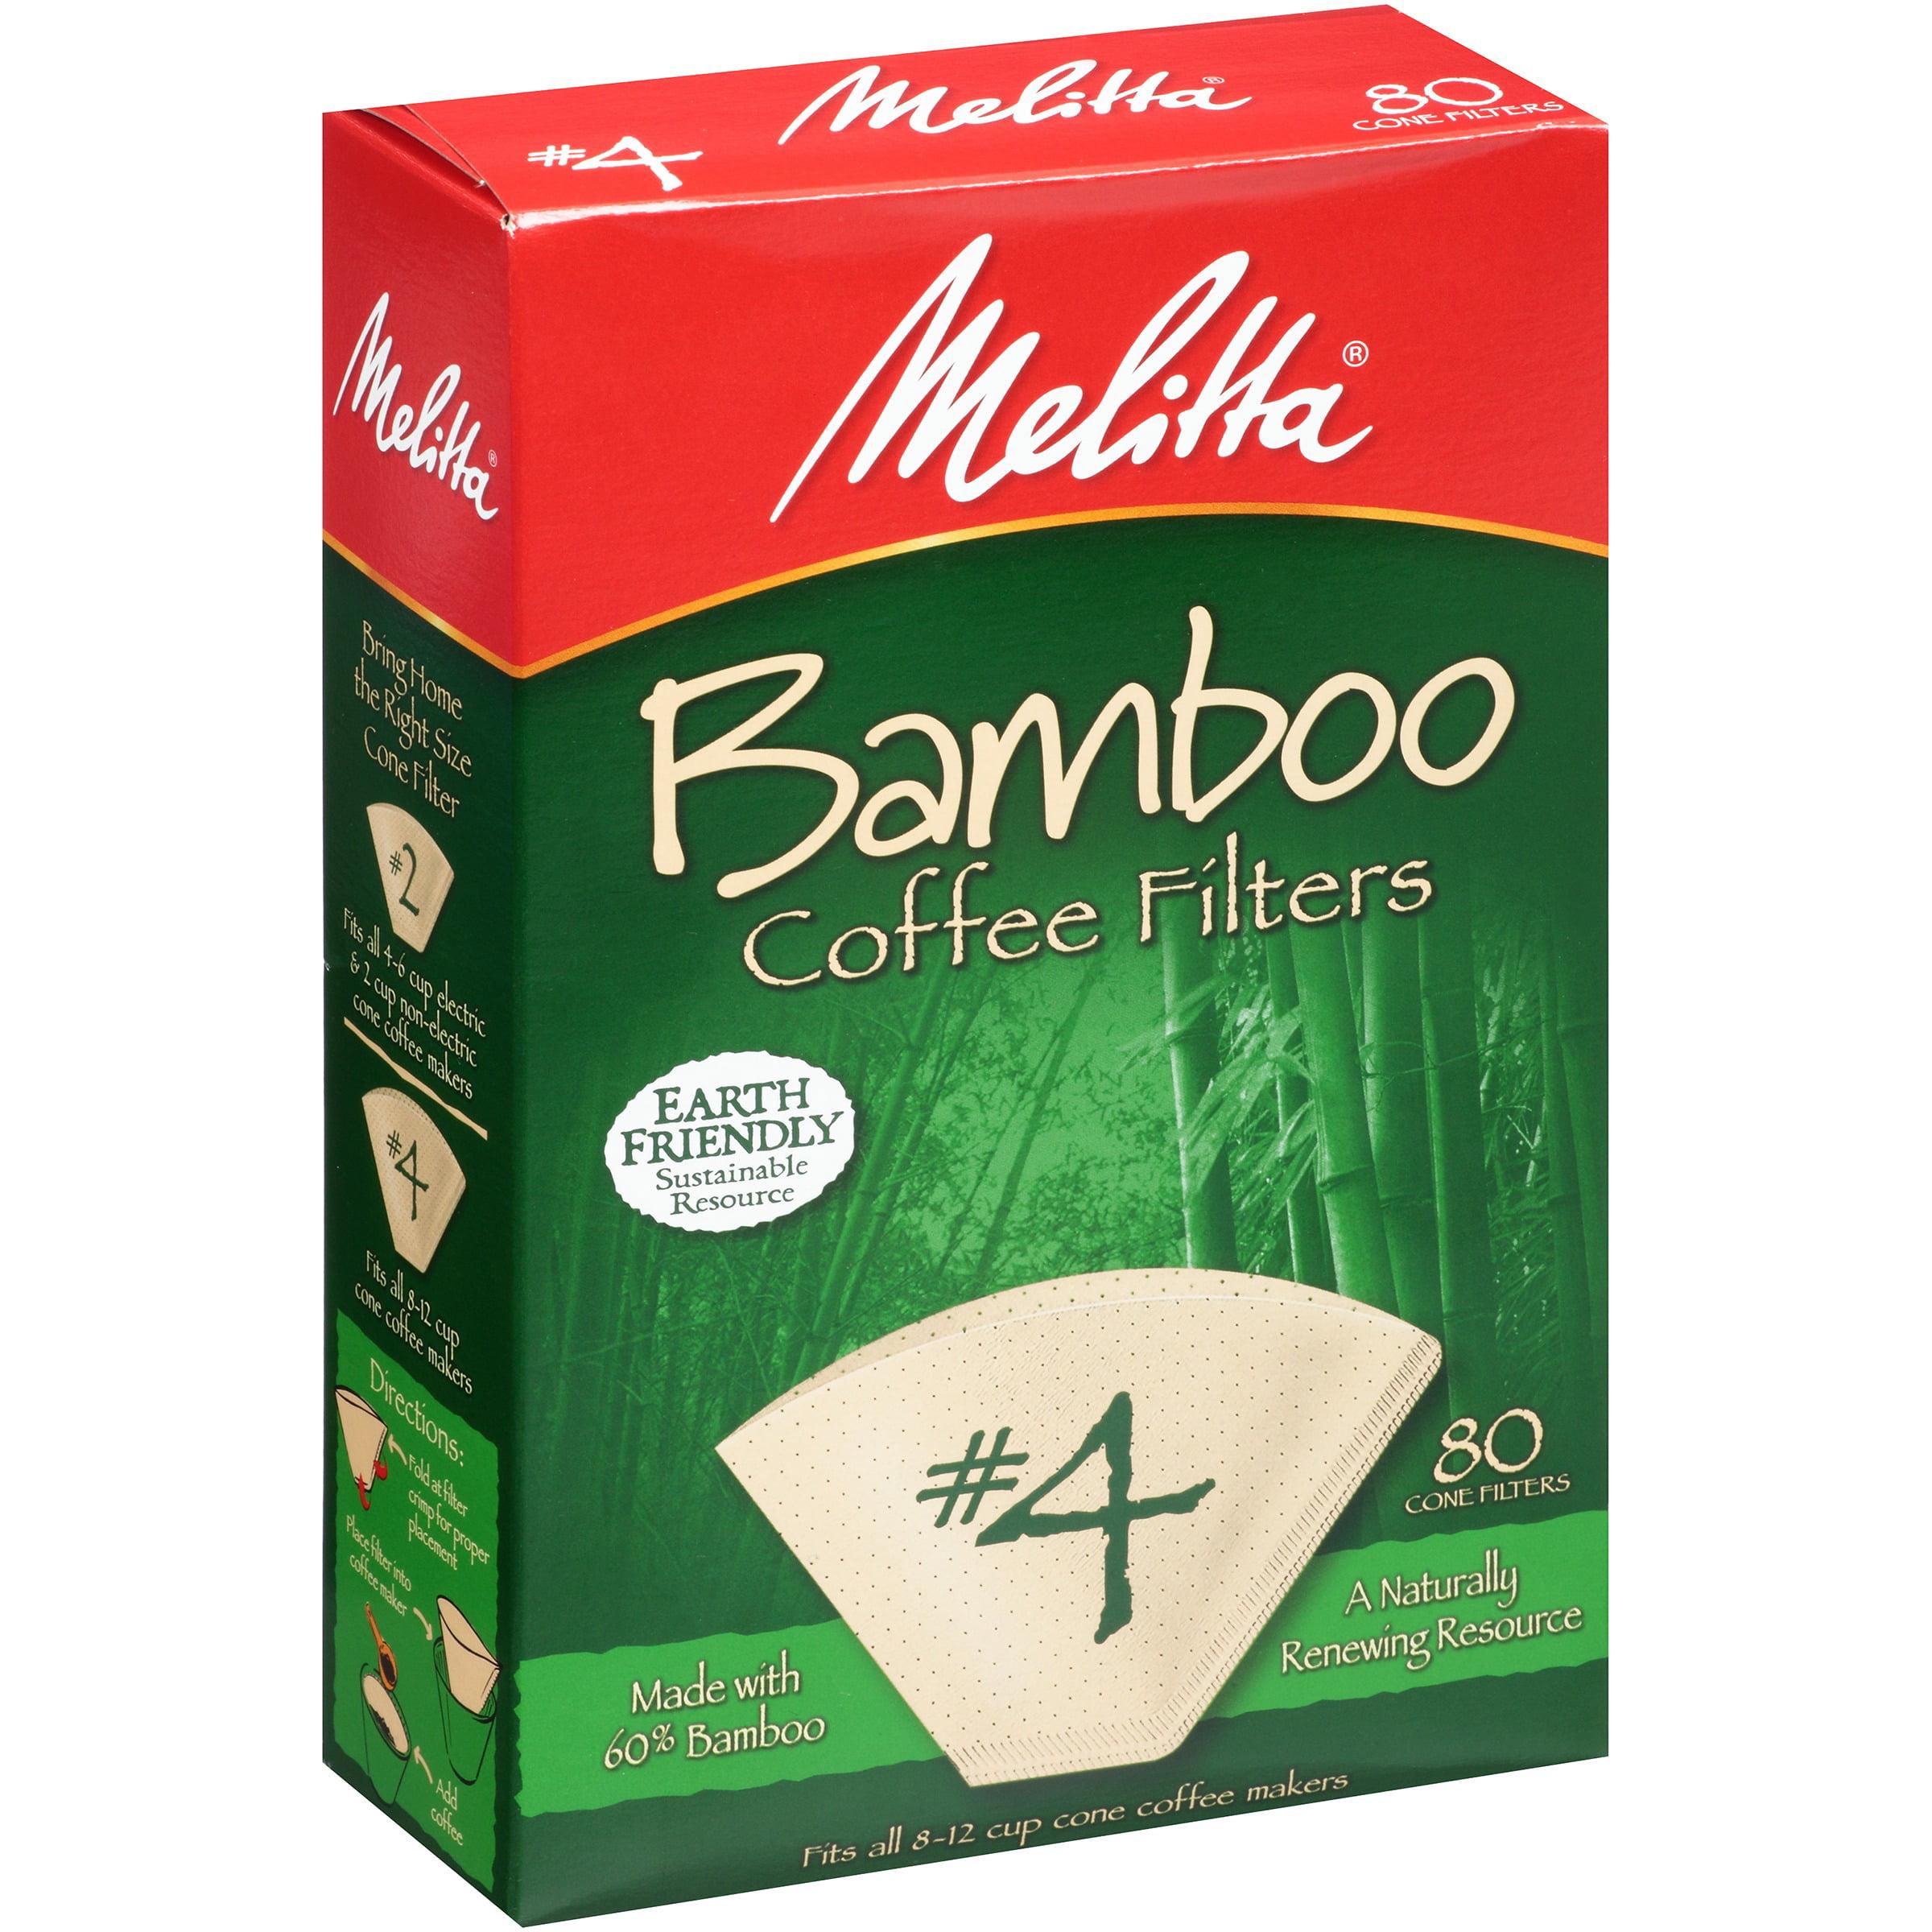 Melitta Bamboo Coffee Filters #4 80 CT by Melitta USA Inc.